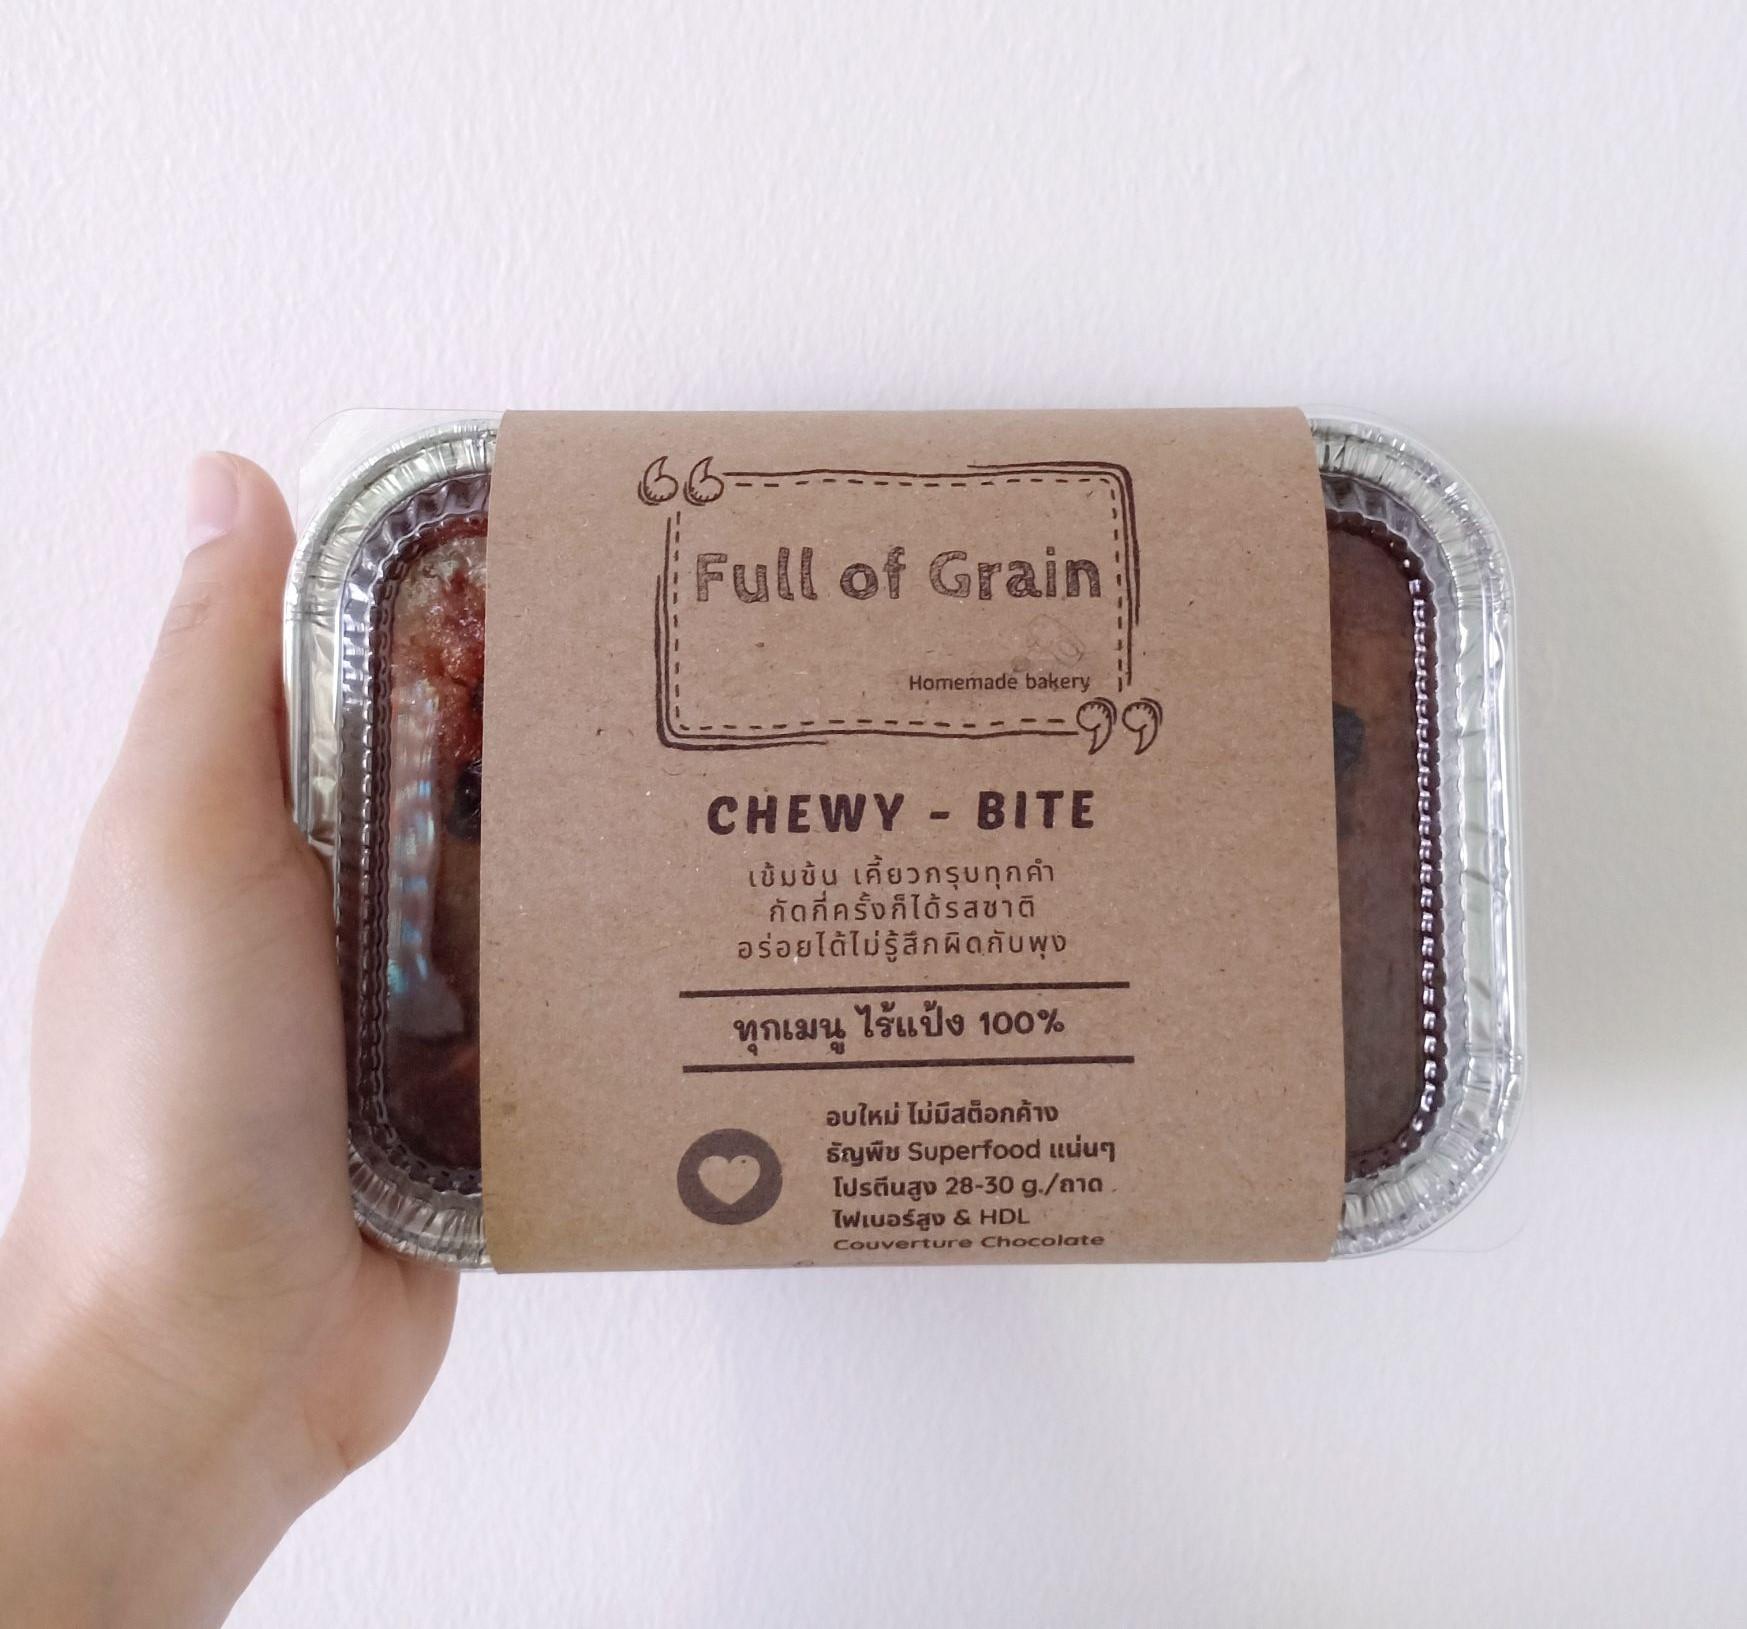 Full of Grain ขนมหวานที่ไร้น้ำตาล